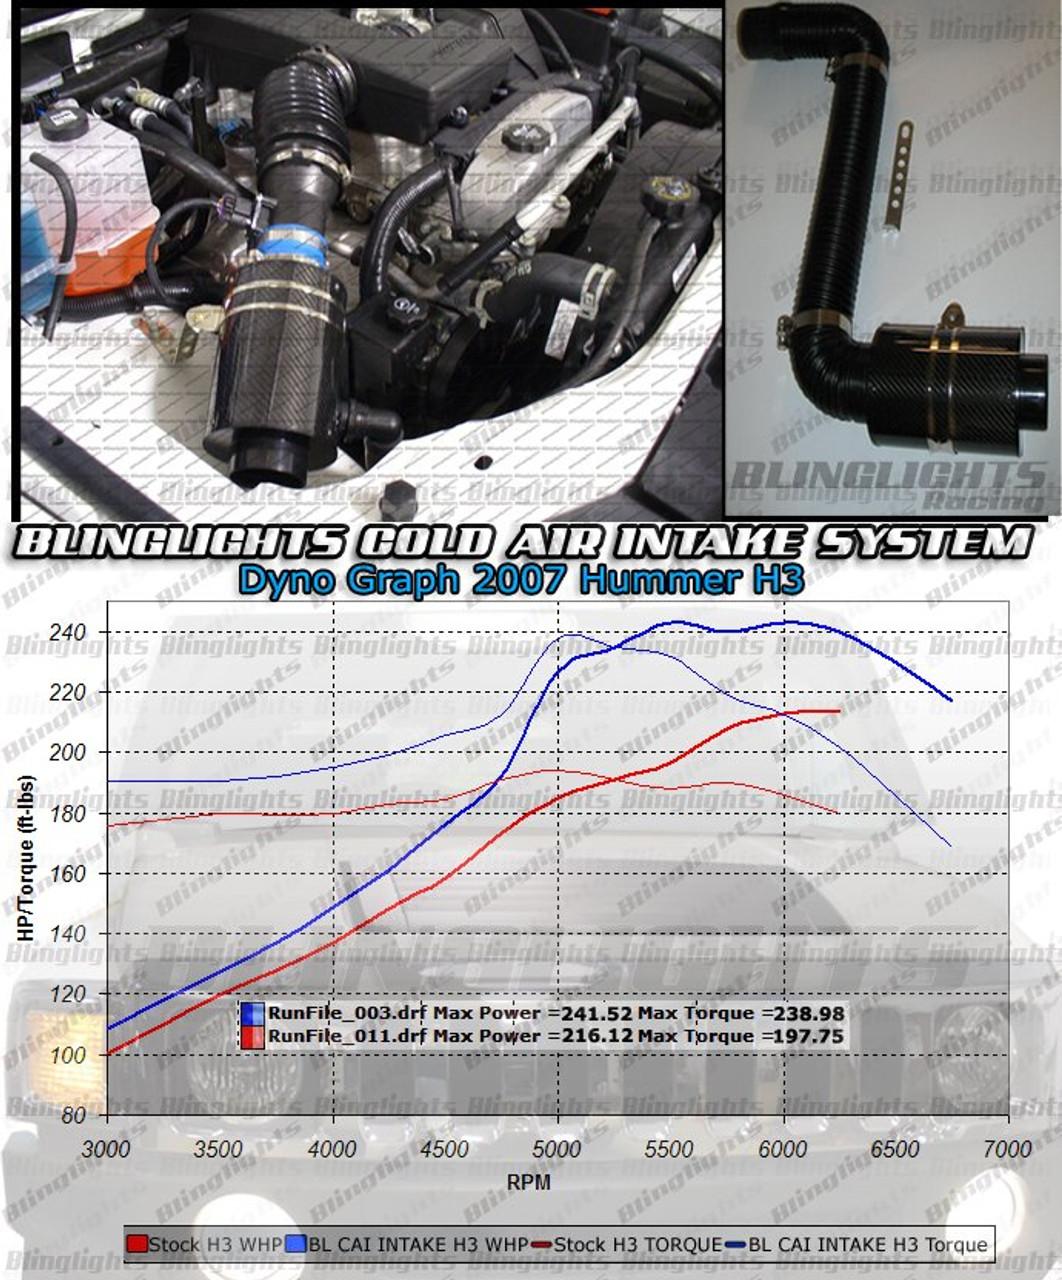 hight resolution of bmw e30 e32 e34 e36 e46 318i 325i m3 cold air intake motor engine performance cai